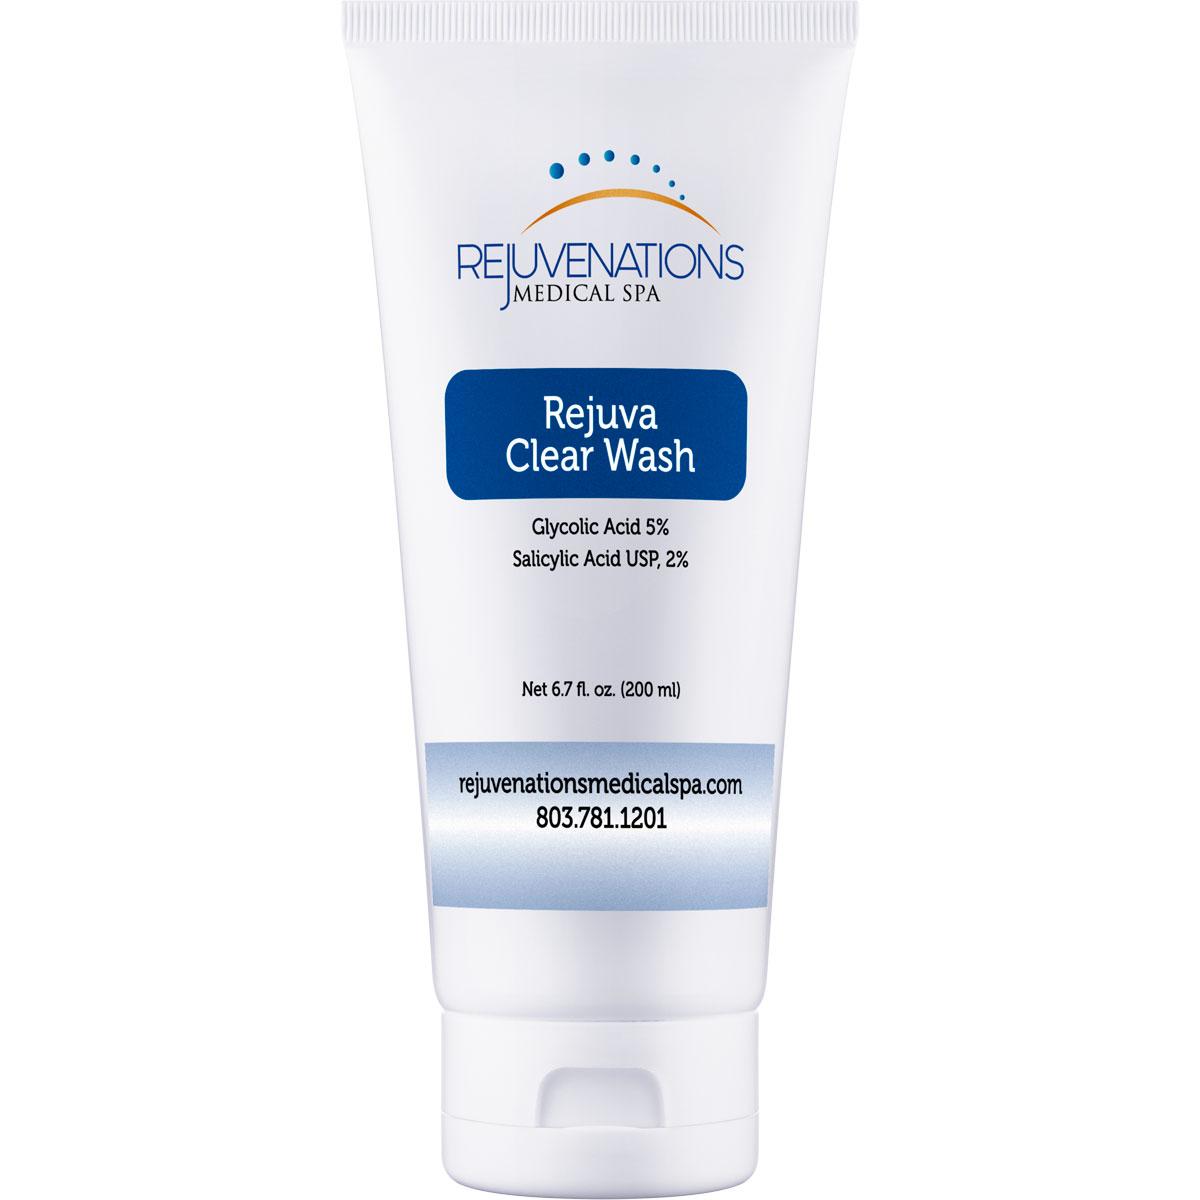 Rejuva Clear Wash